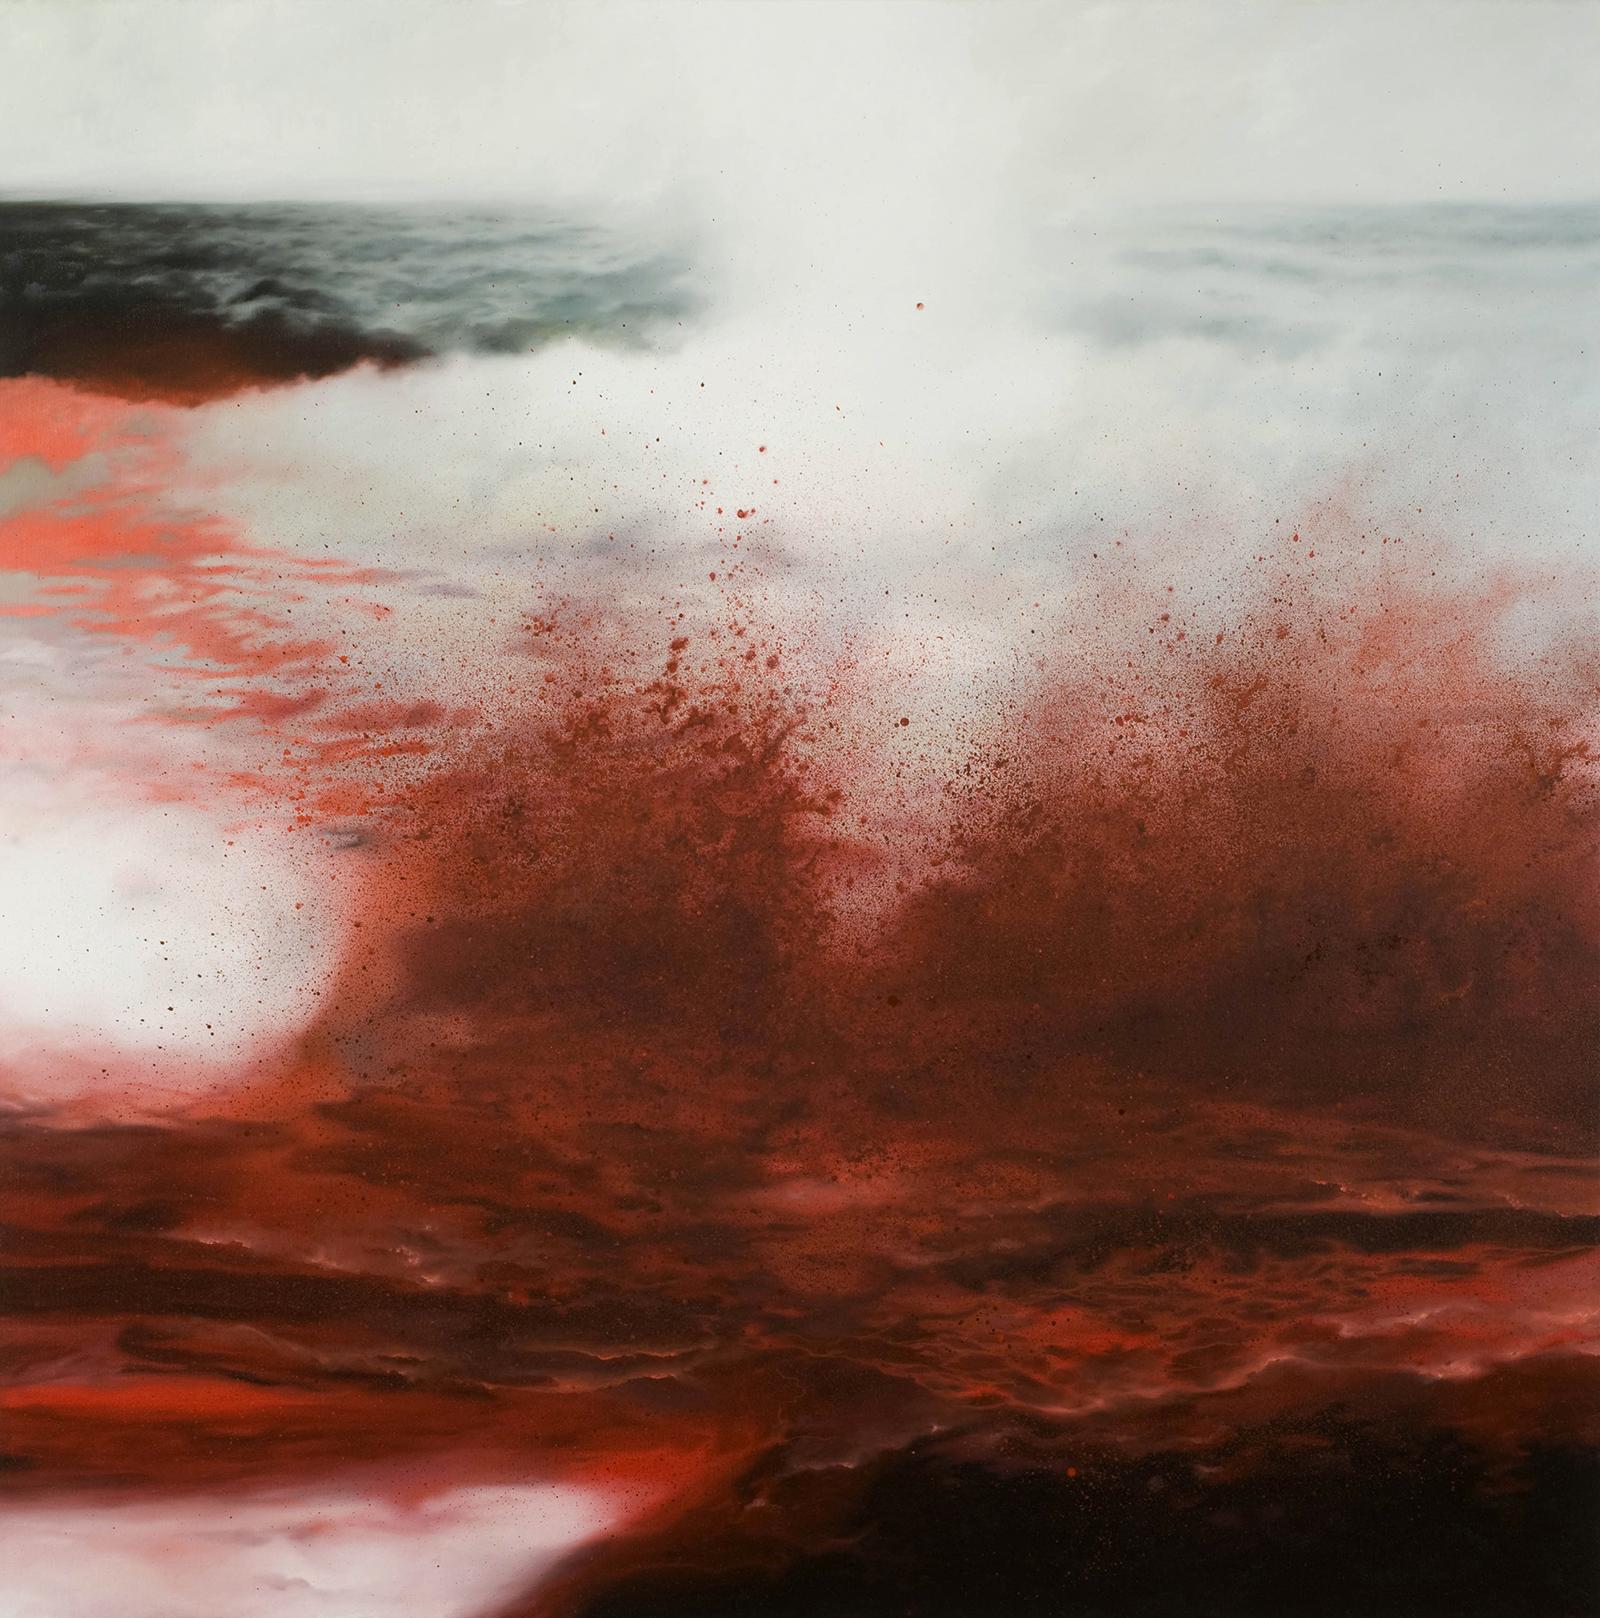 Nordmeer 2006, 120 x 120 cm, Öl auf Leinwand  North Atlantic 2006, 120 x 120 cm, oil on canvas